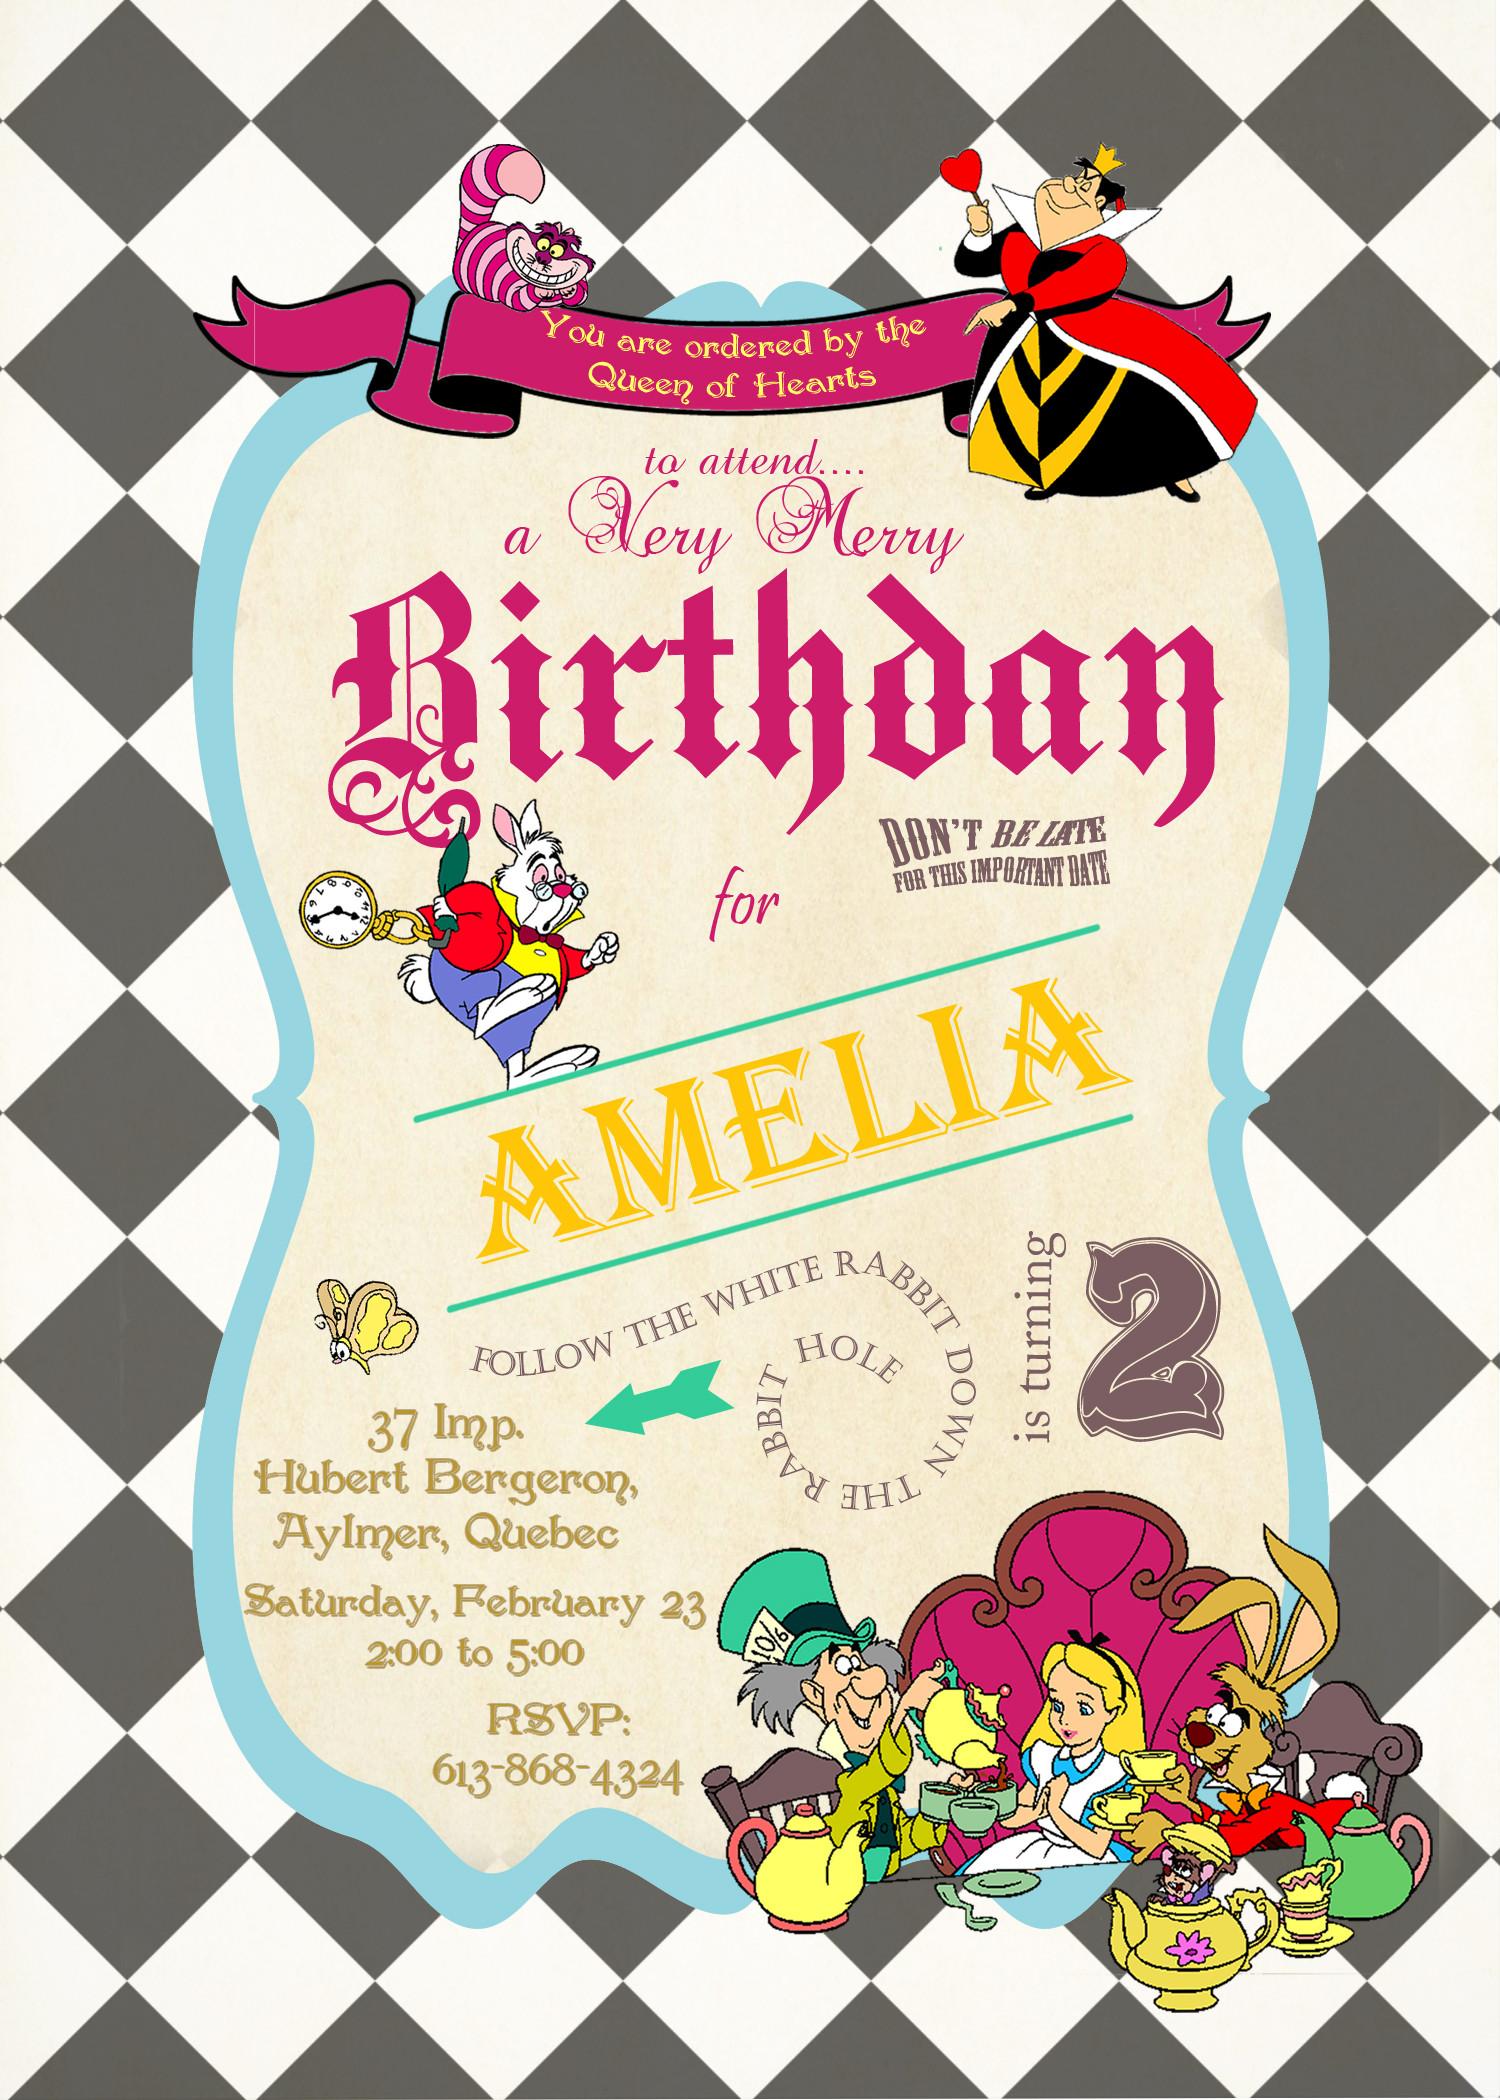 Best ideas about Alice In Wonderland Birthday Invitations . Save or Pin Alice in Wonderland Birthday Invitations Now.